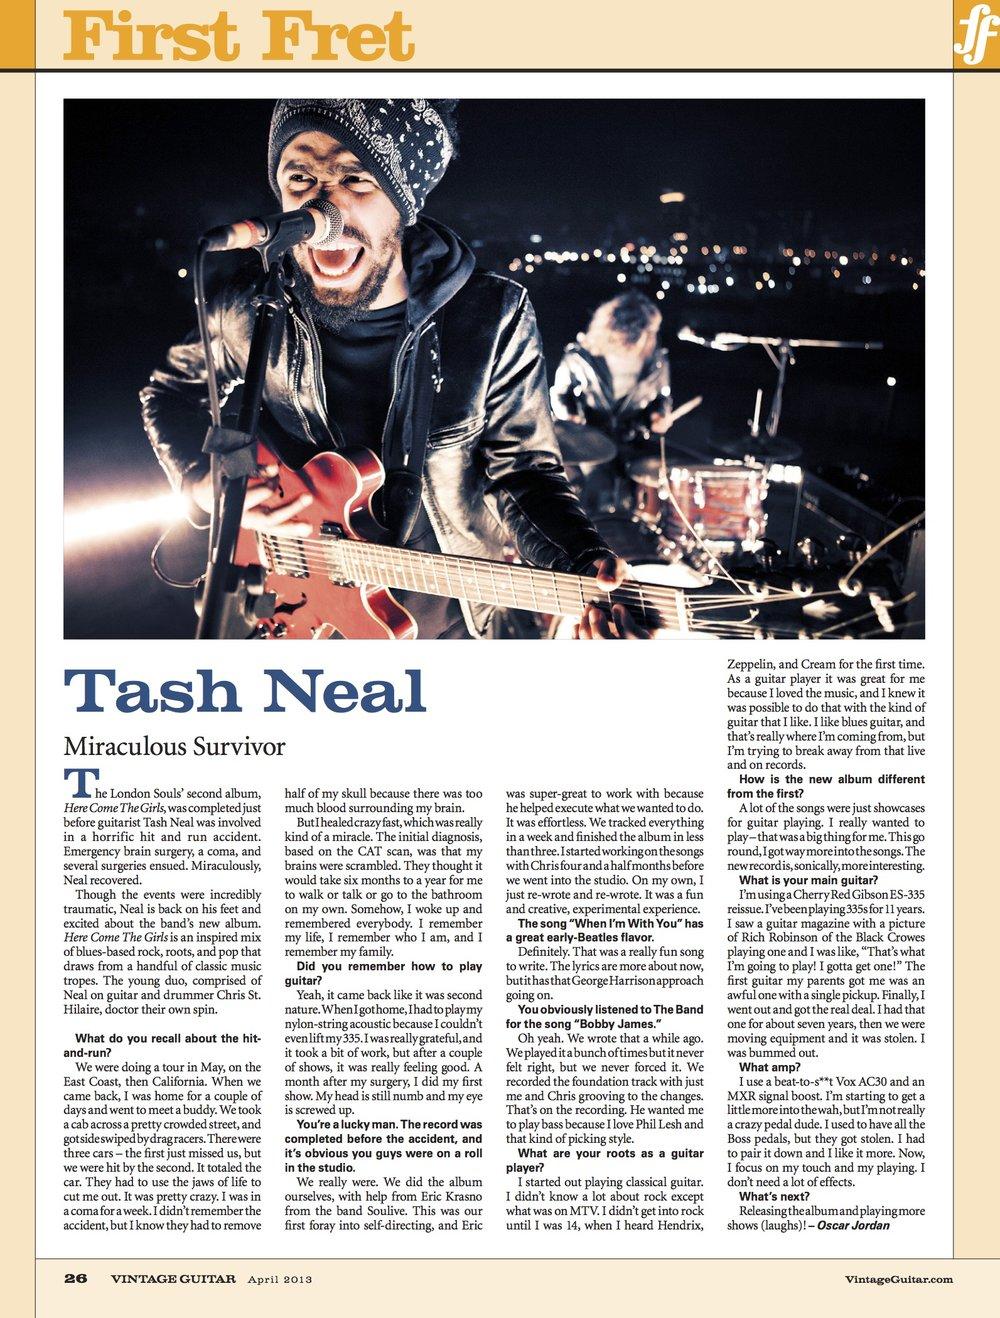 TASH NEAL APR2013.jpg